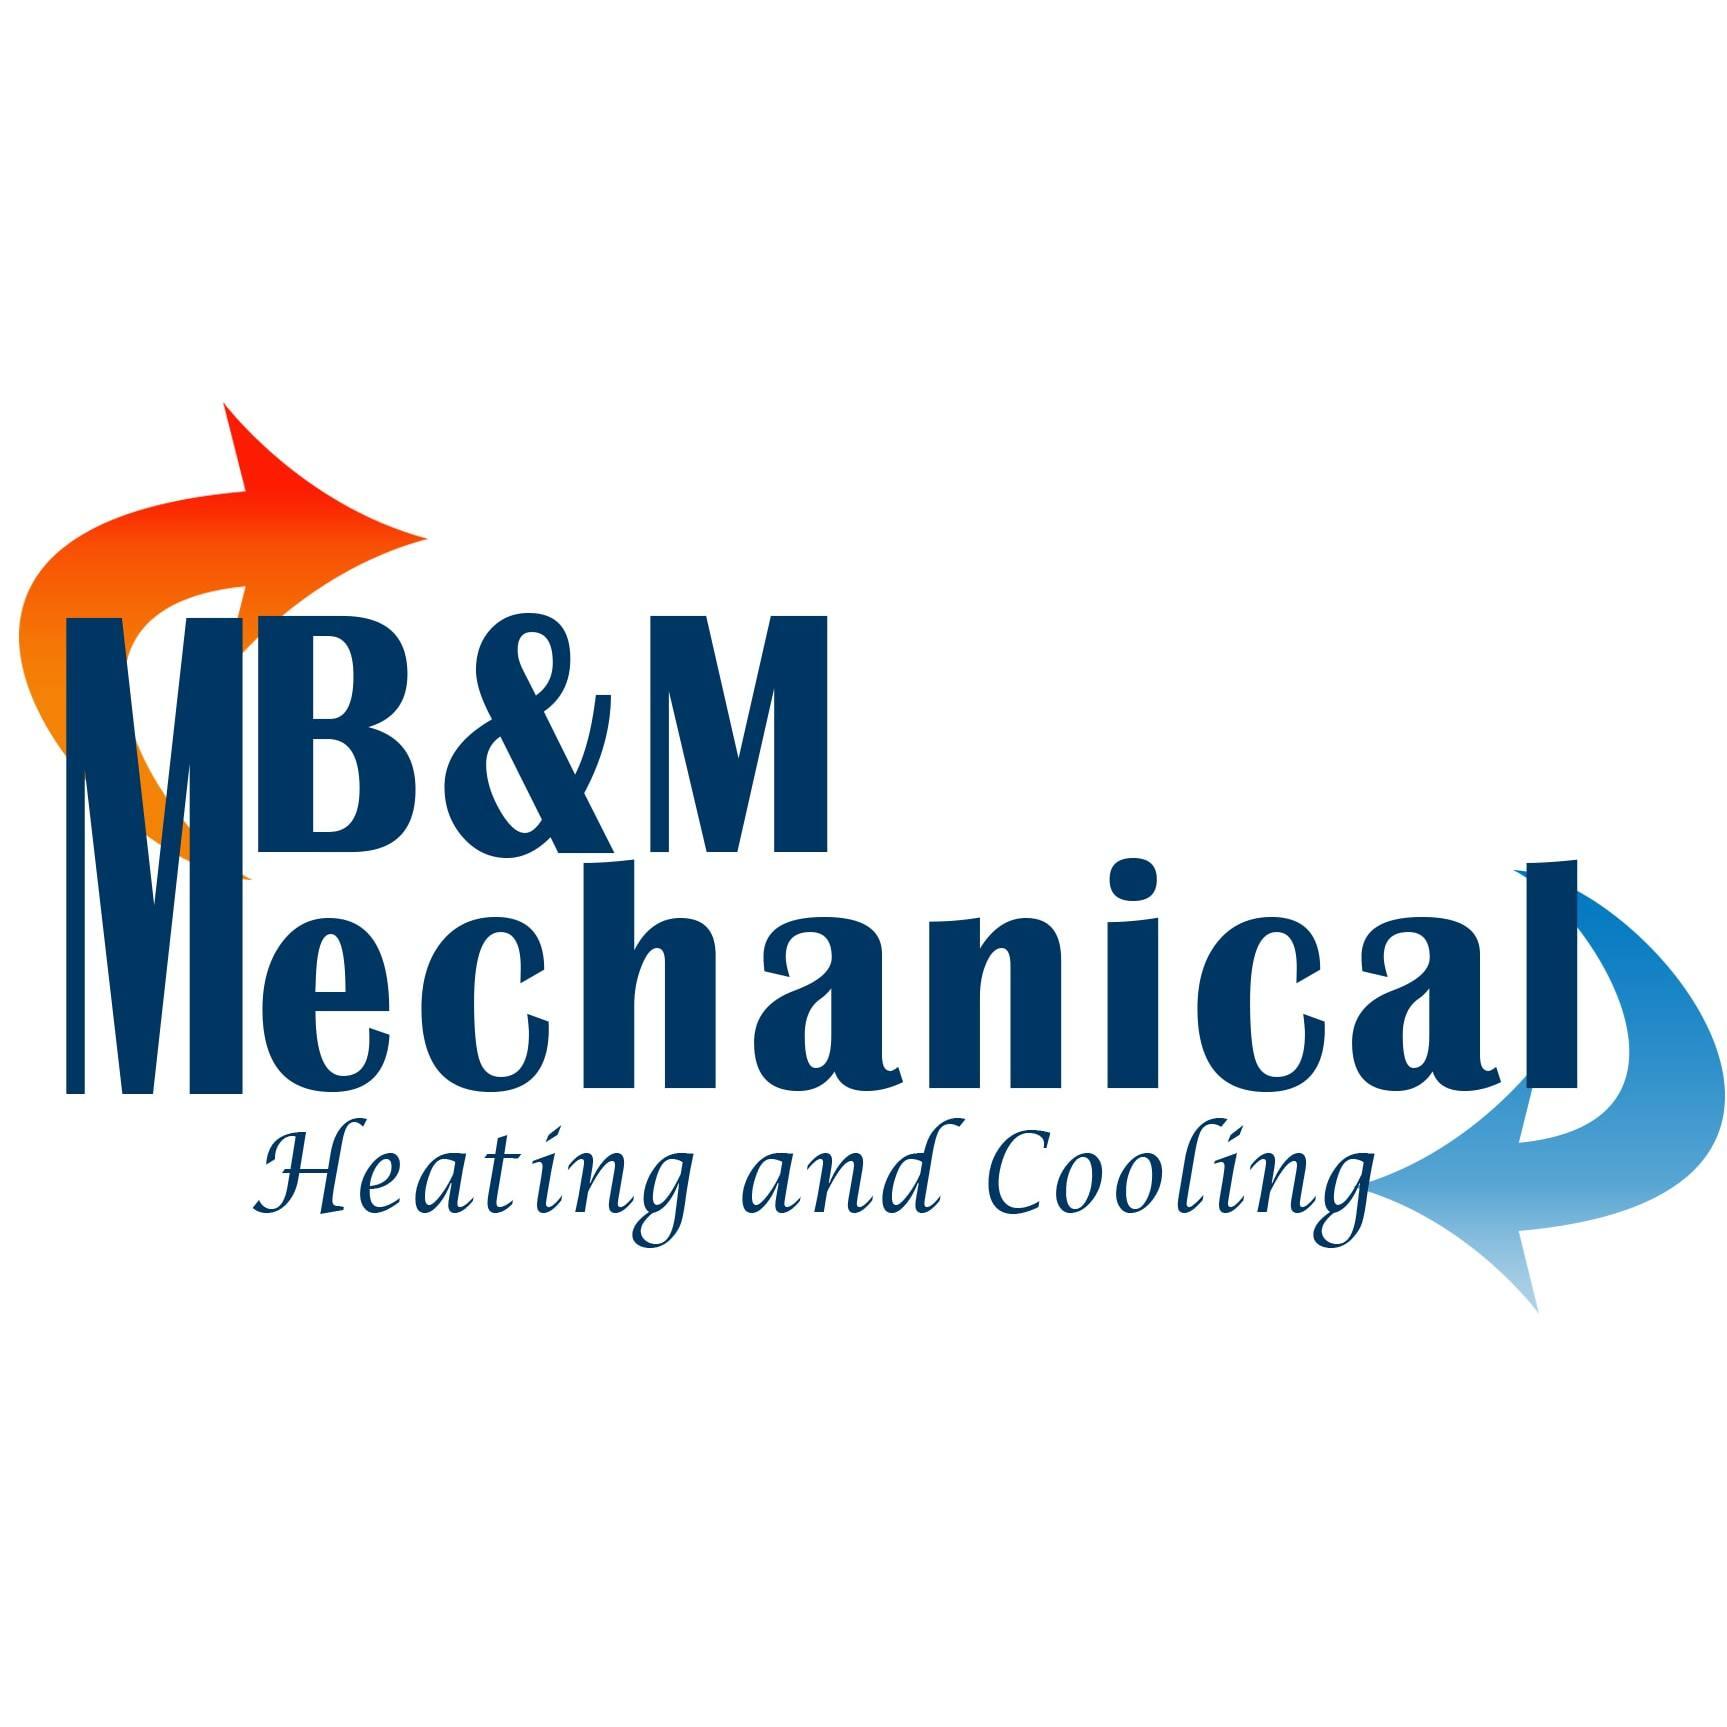 B&M Mechanical